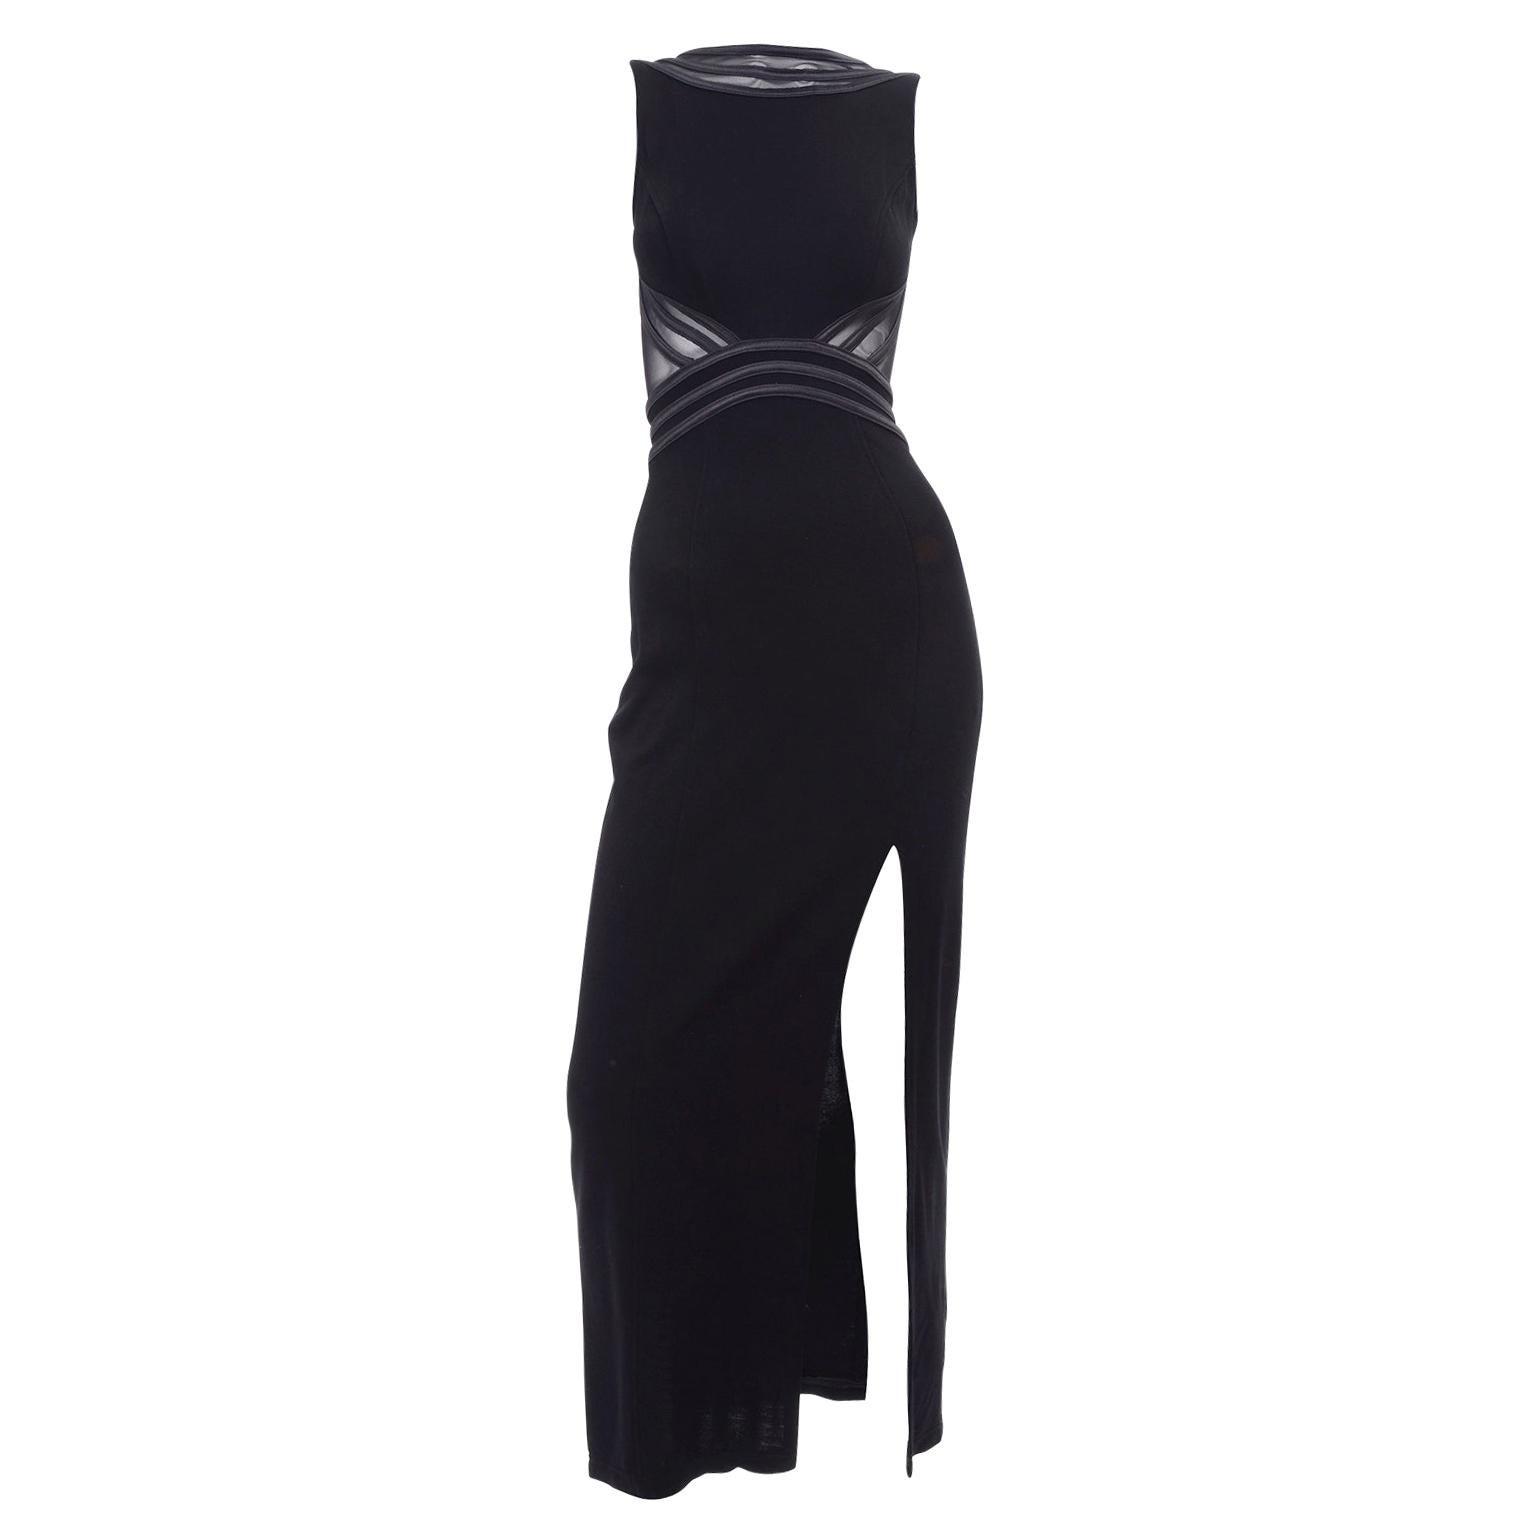 1990s Tadashi Vintage Black Evening Dress With Mesh Inserts & High Slit